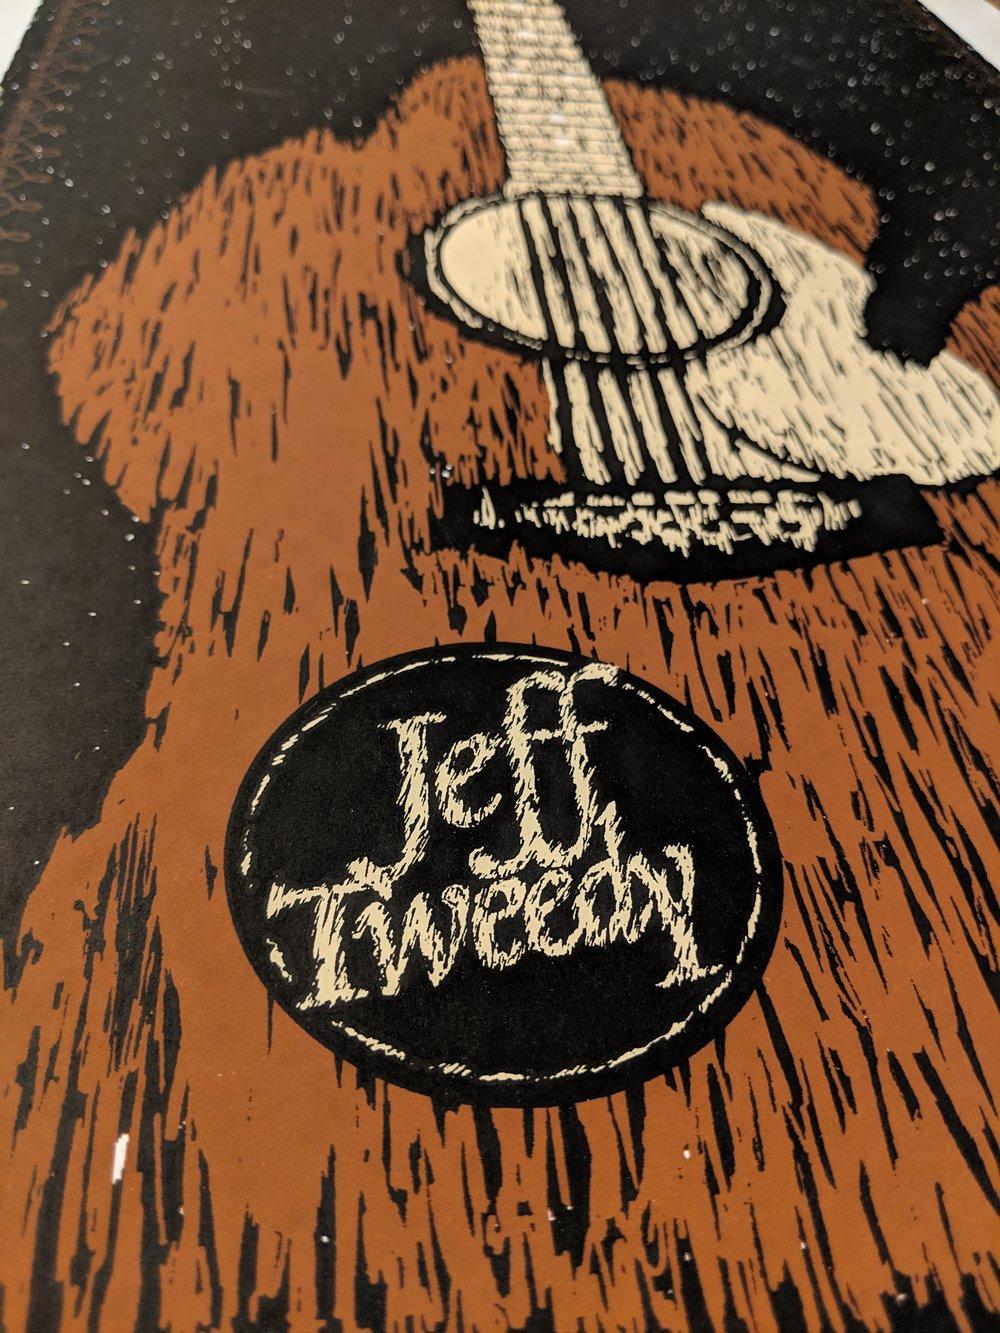 Jeff Tweedy - Kalamazoo, Michigan